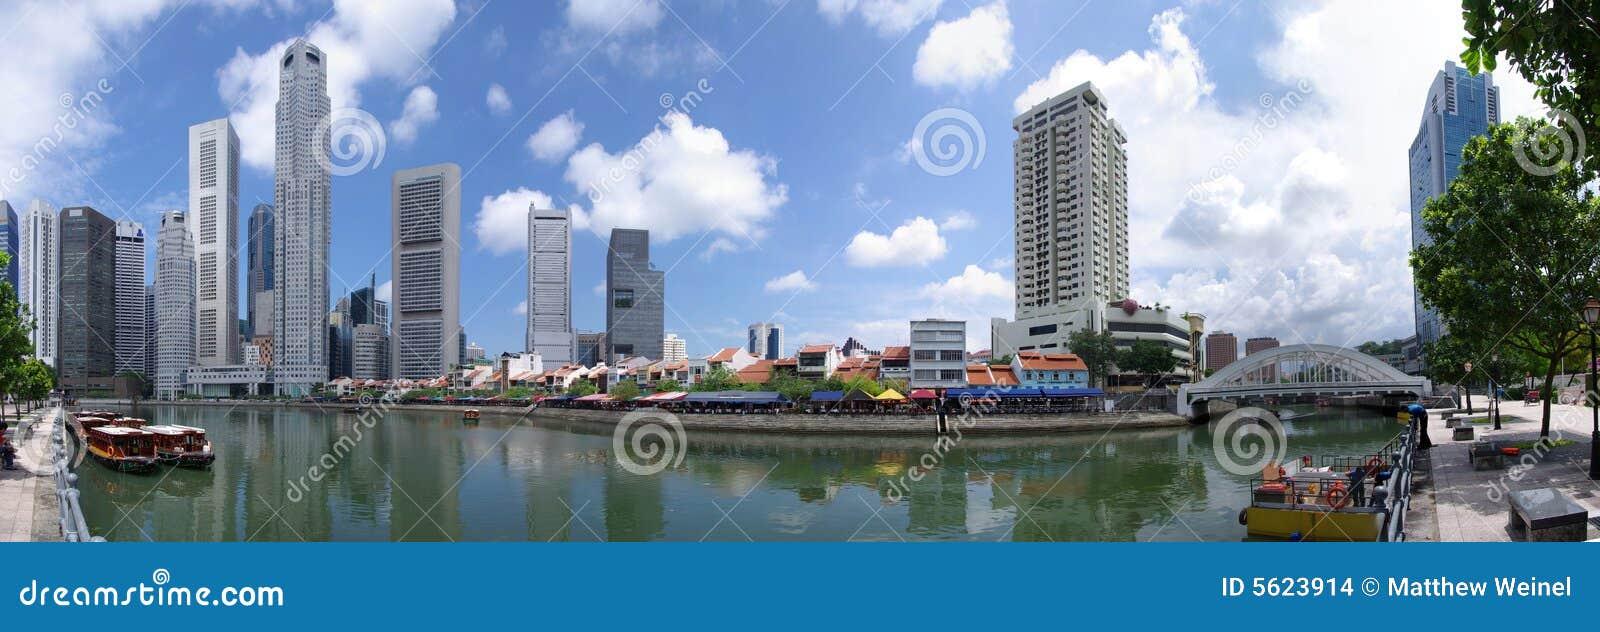 Quay raffles горизонт singapore